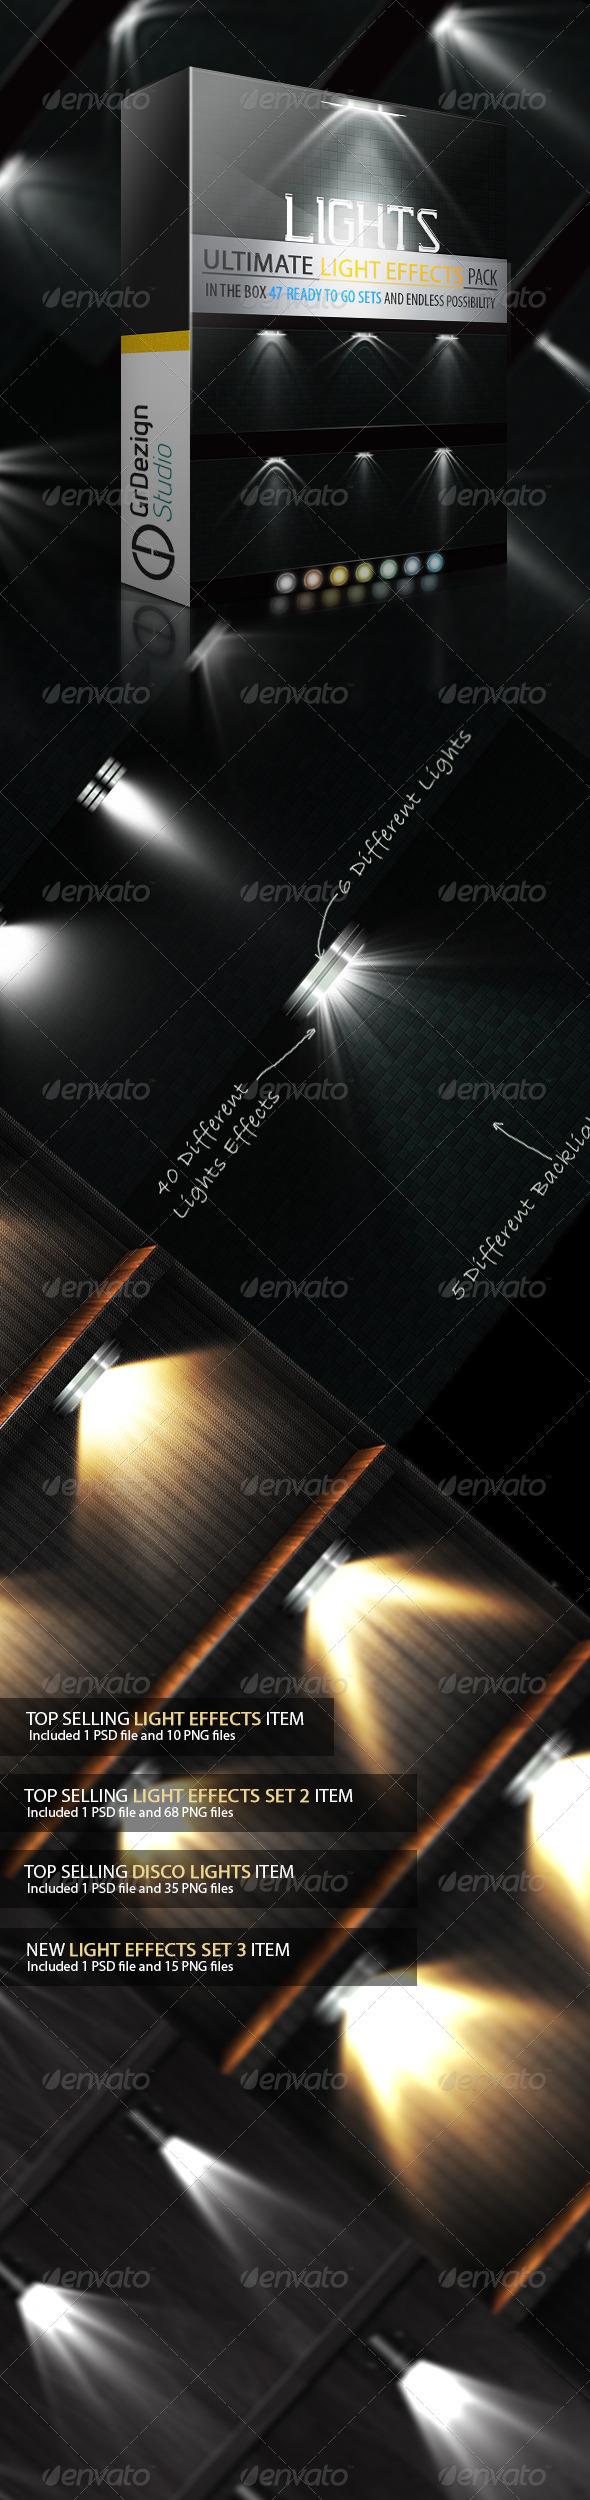 Light Effects Ultimate Bundle - Decorative Graphics